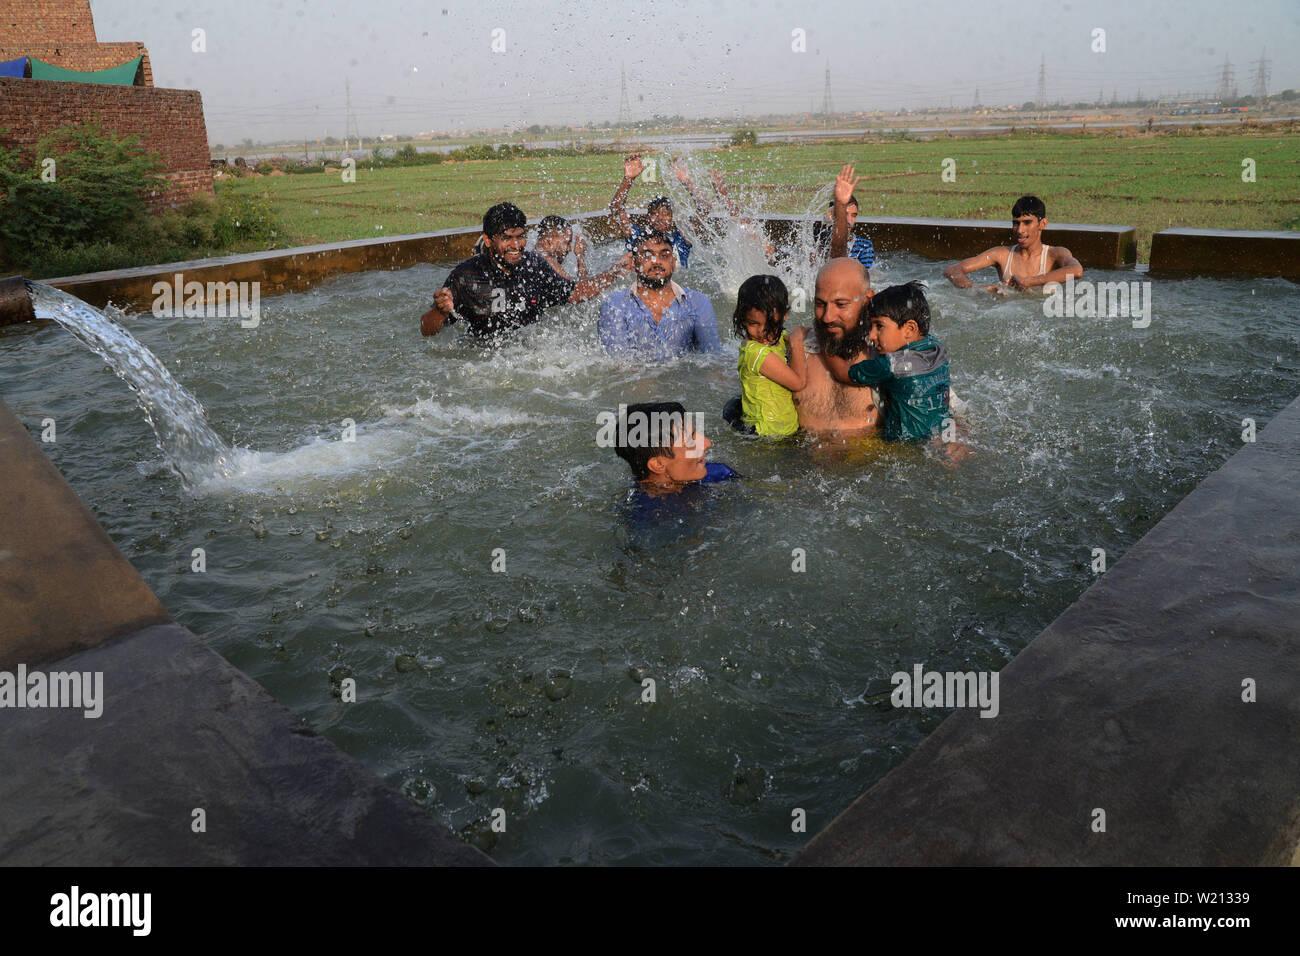 Lahore, Pakistan  01st July, 2019  Pakistani youths cool off